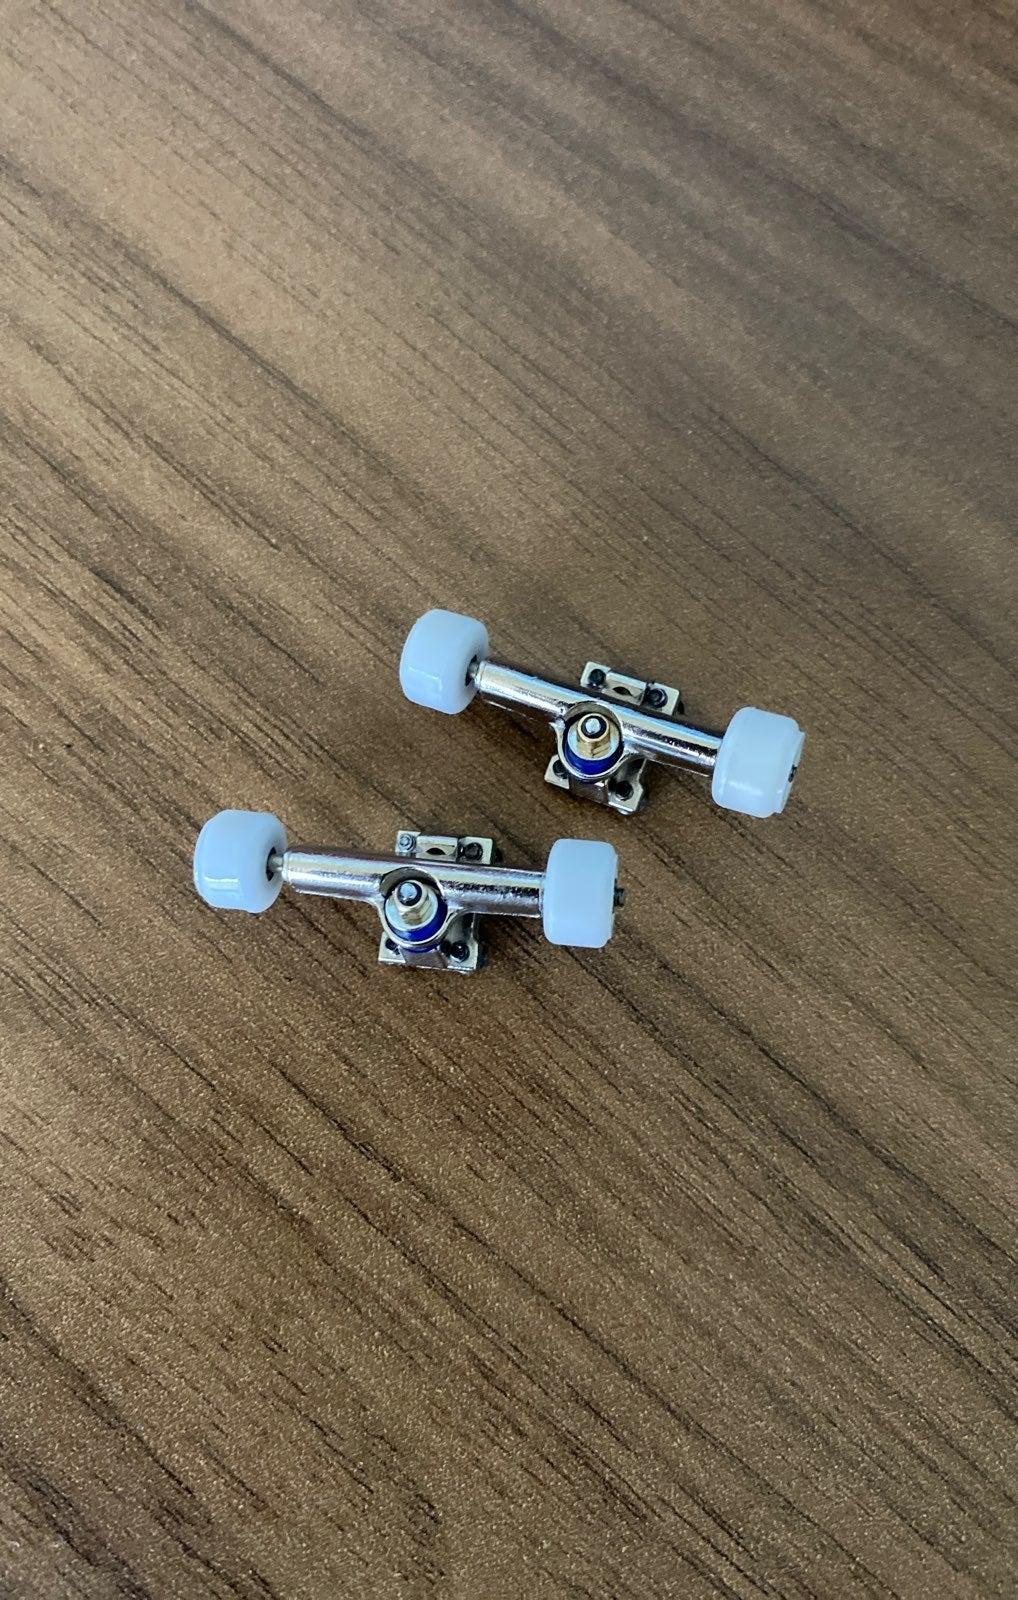 Brand new fingerboard trucks and wheels